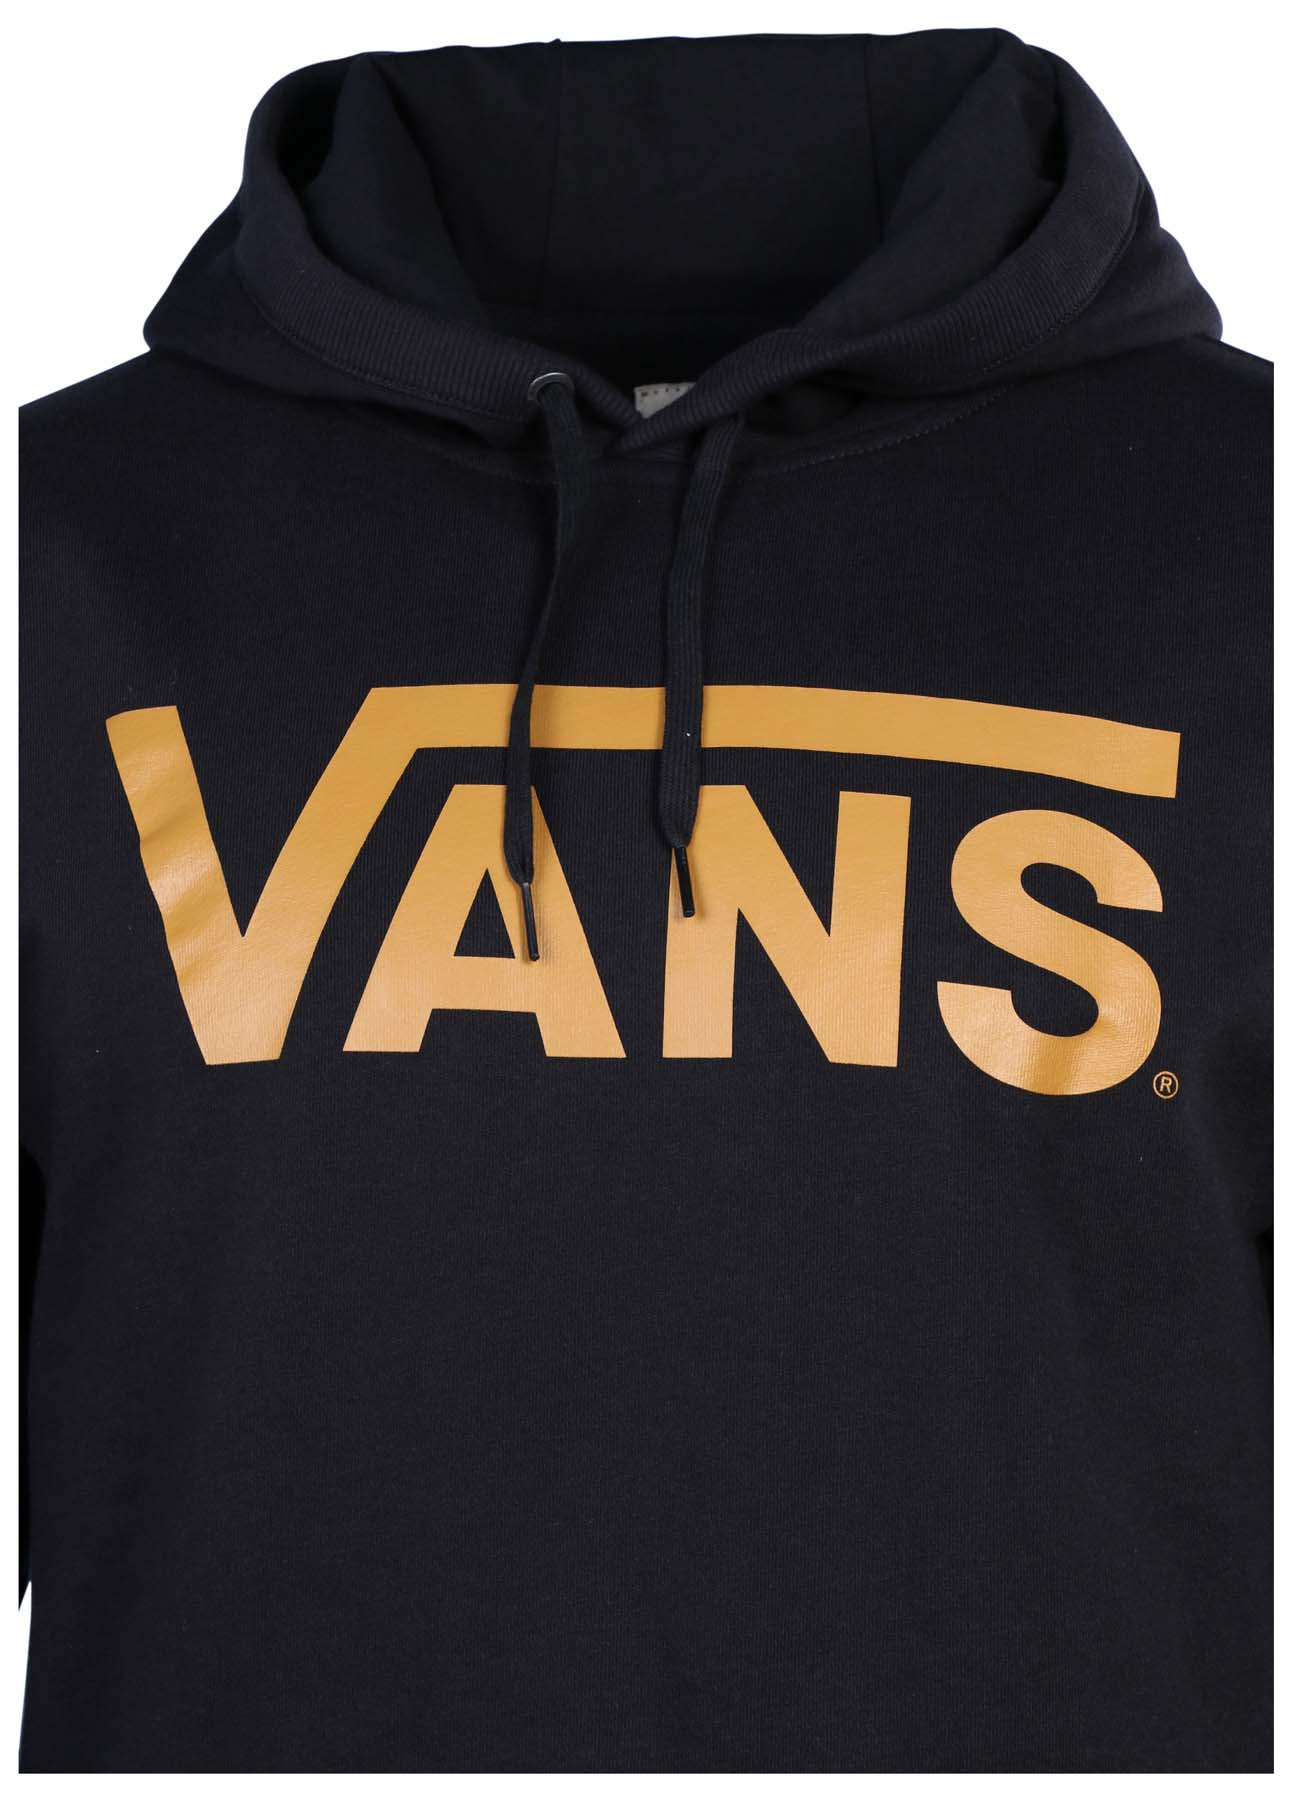 Vans Men's Classic Vans Skateboarding Pullover Hoodie